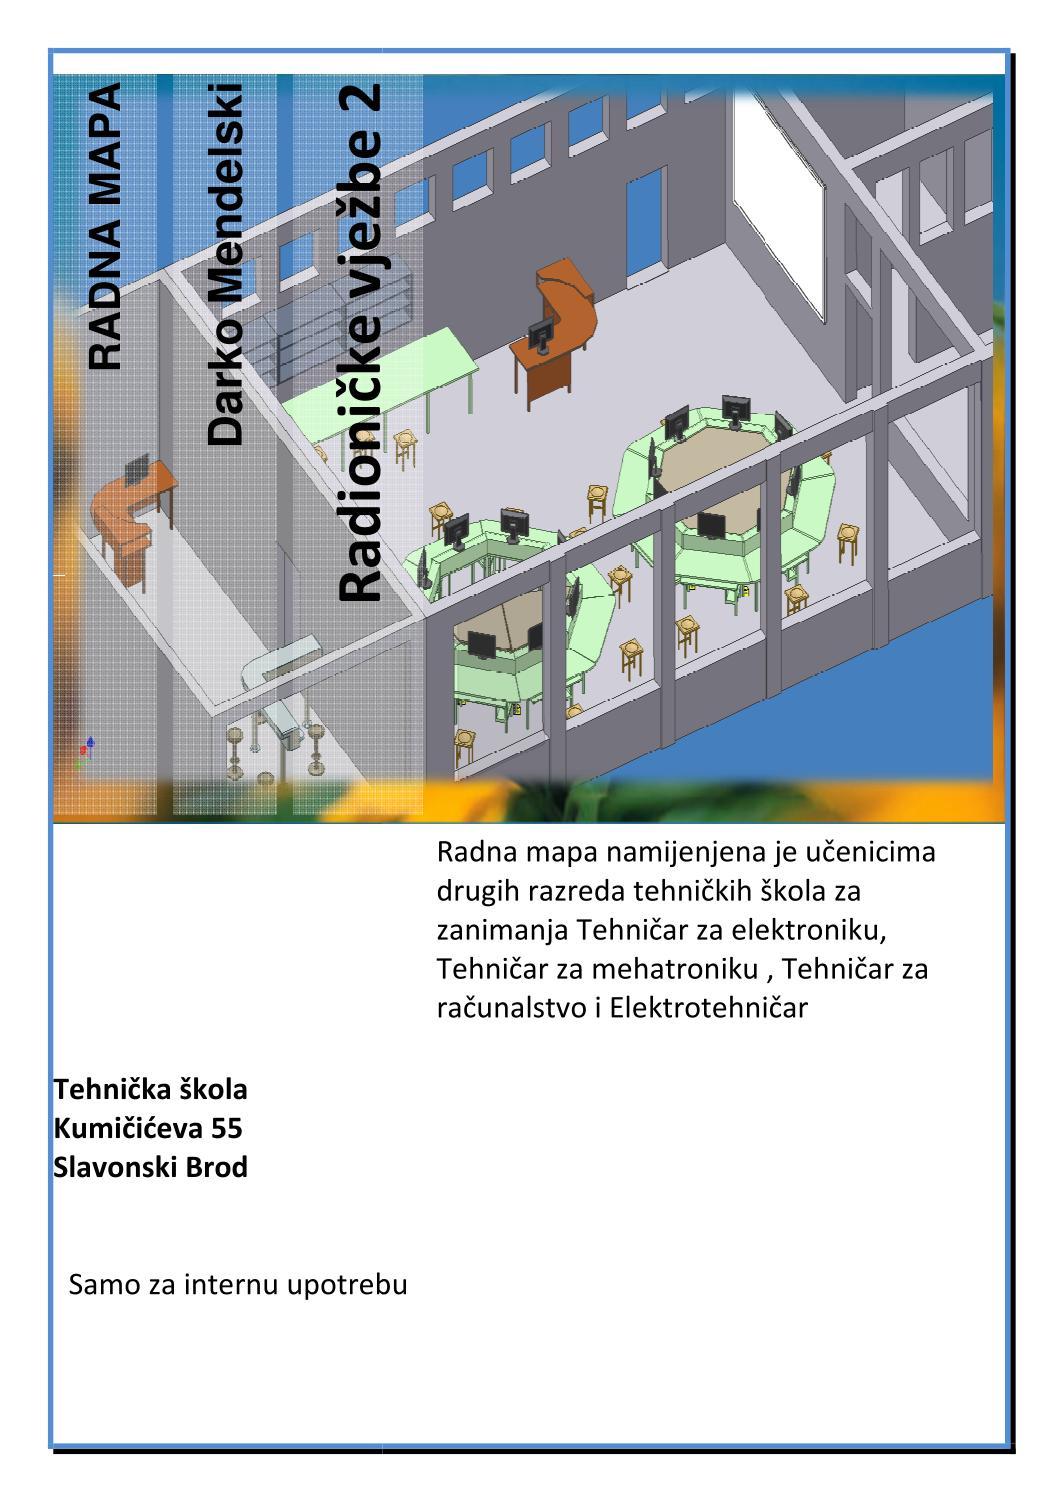 Radionike Vjebe 2 By Darko Mendelski Issuu Additional Privileges View Printed Circuit Boards Tiskane Ploice